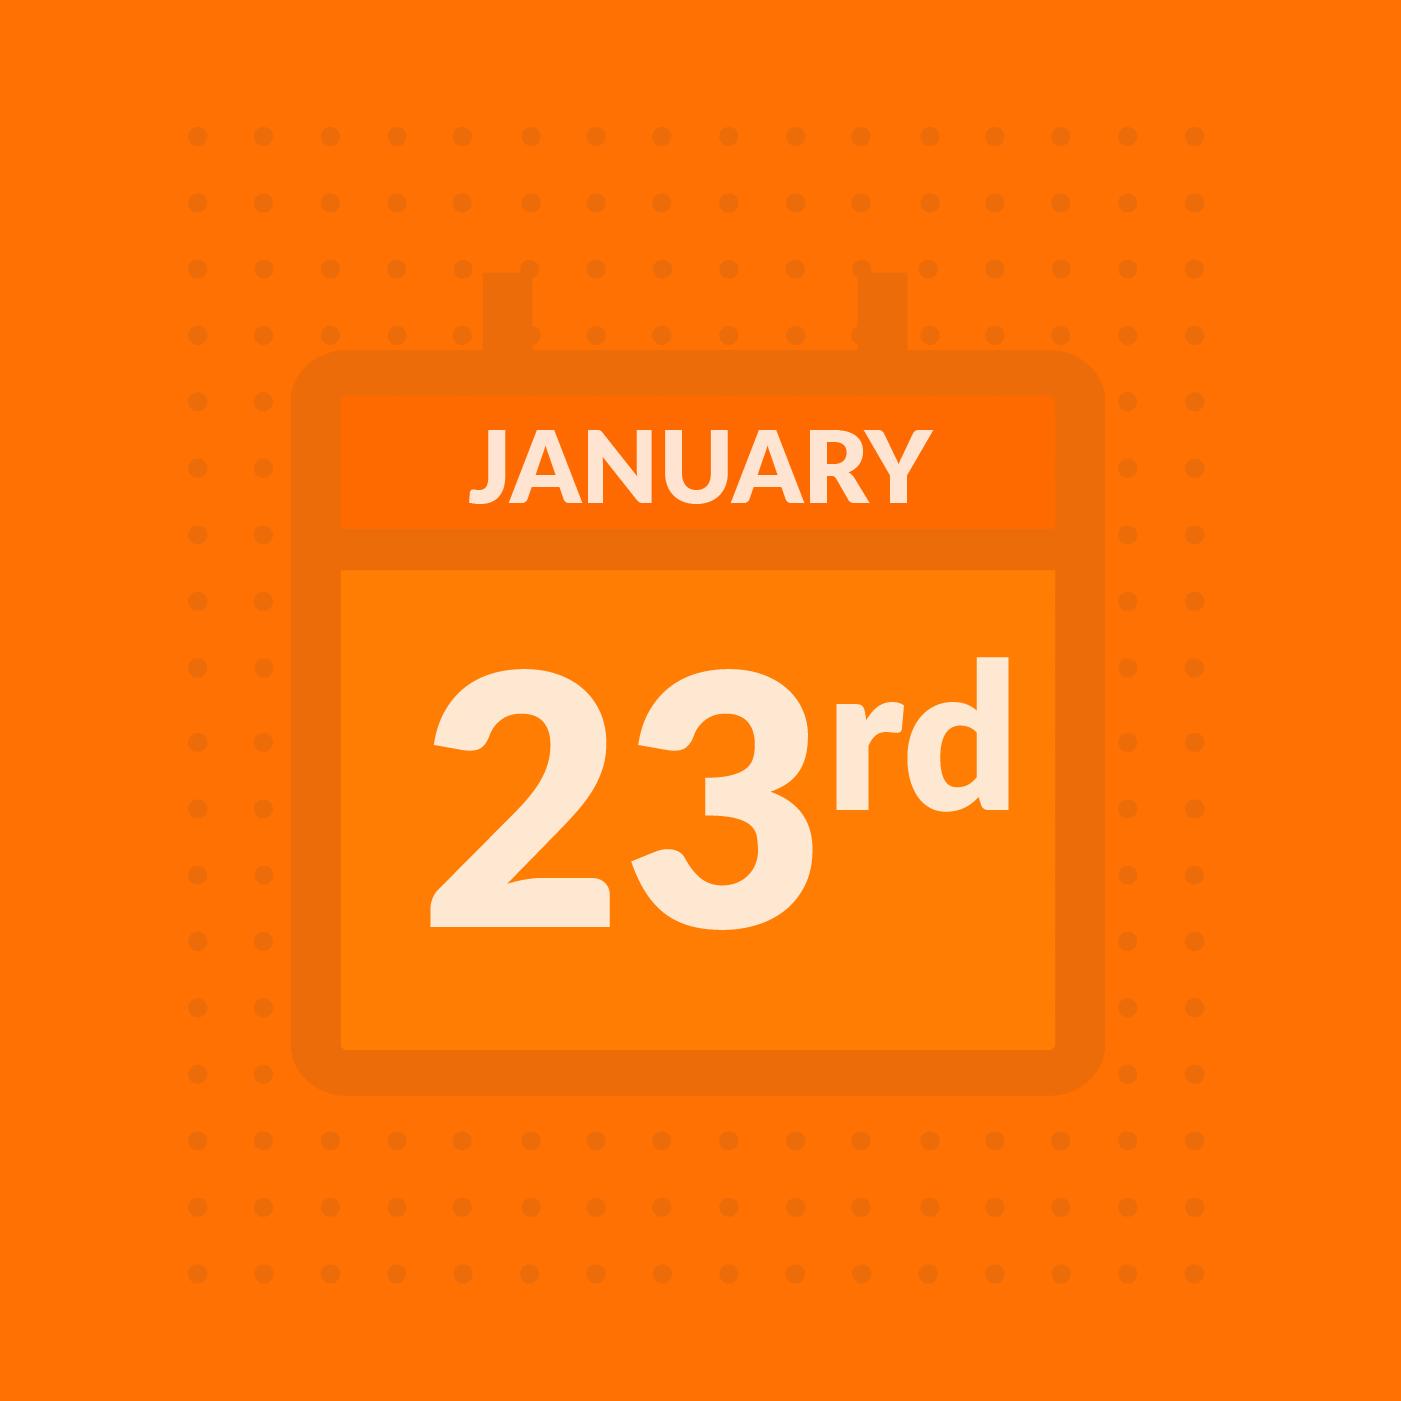 Jan. 23rd: World Economic Forum Develops CBDC Framework